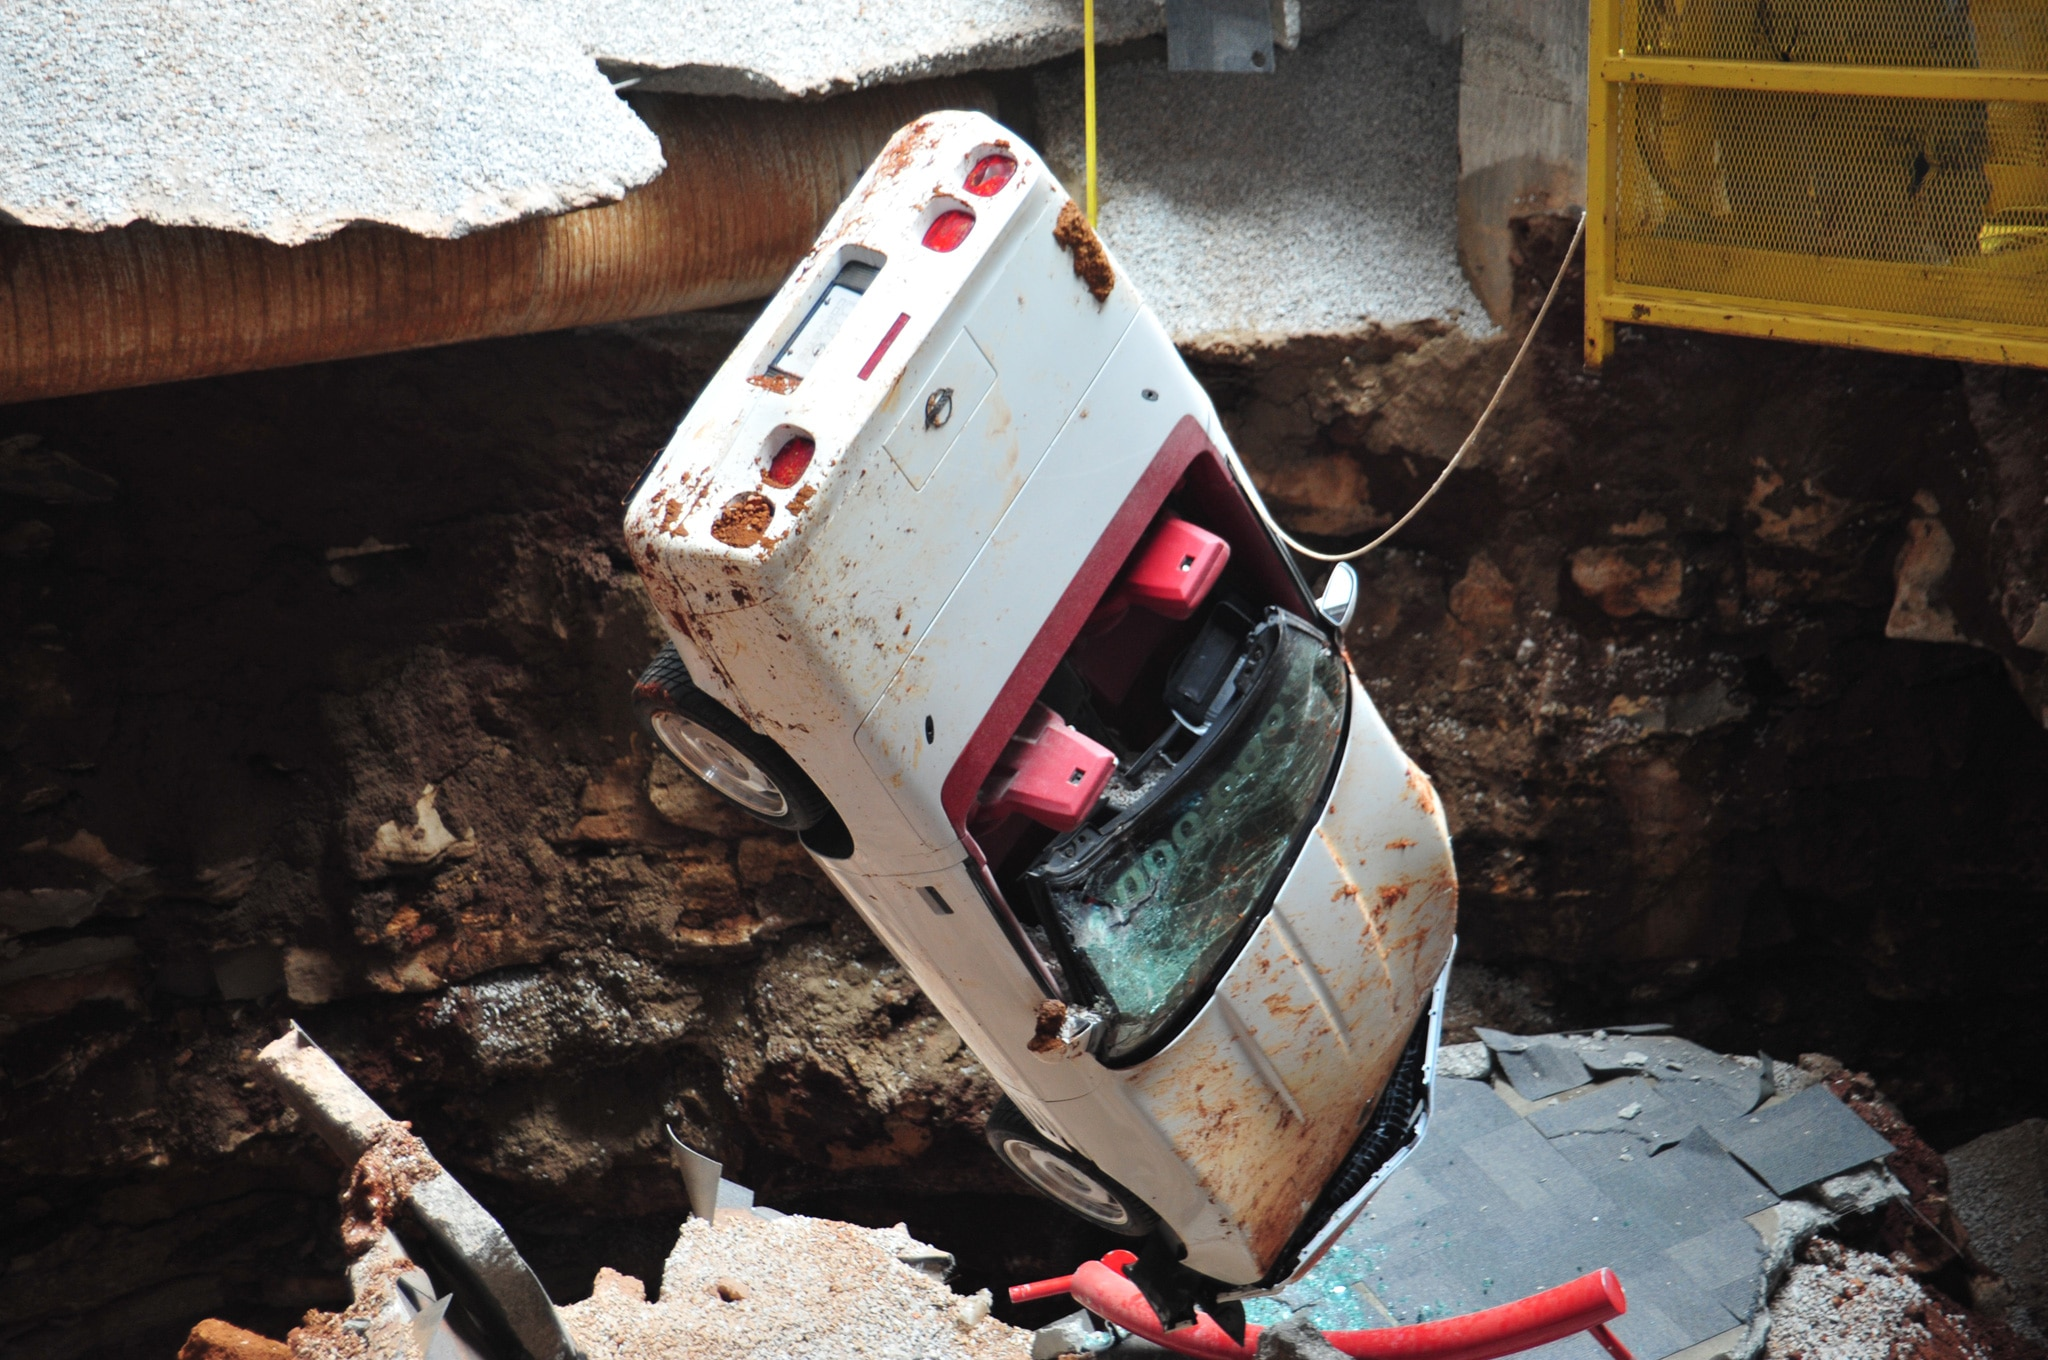 GM Finishes Restoration of 1992 Chevrolet Corvette Damaged ...